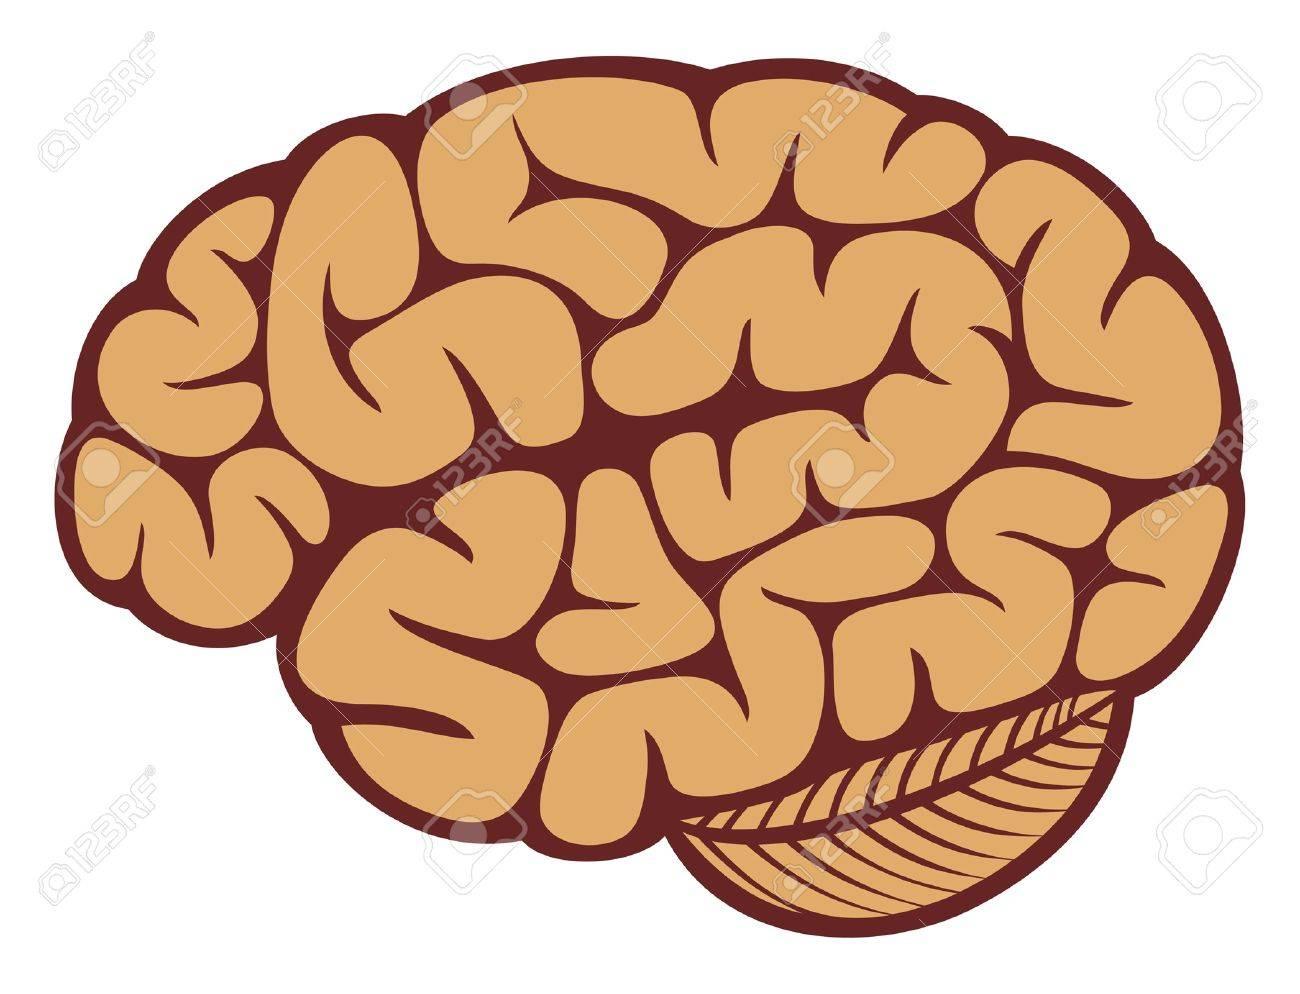 The human brain Stock Vector - 14836395